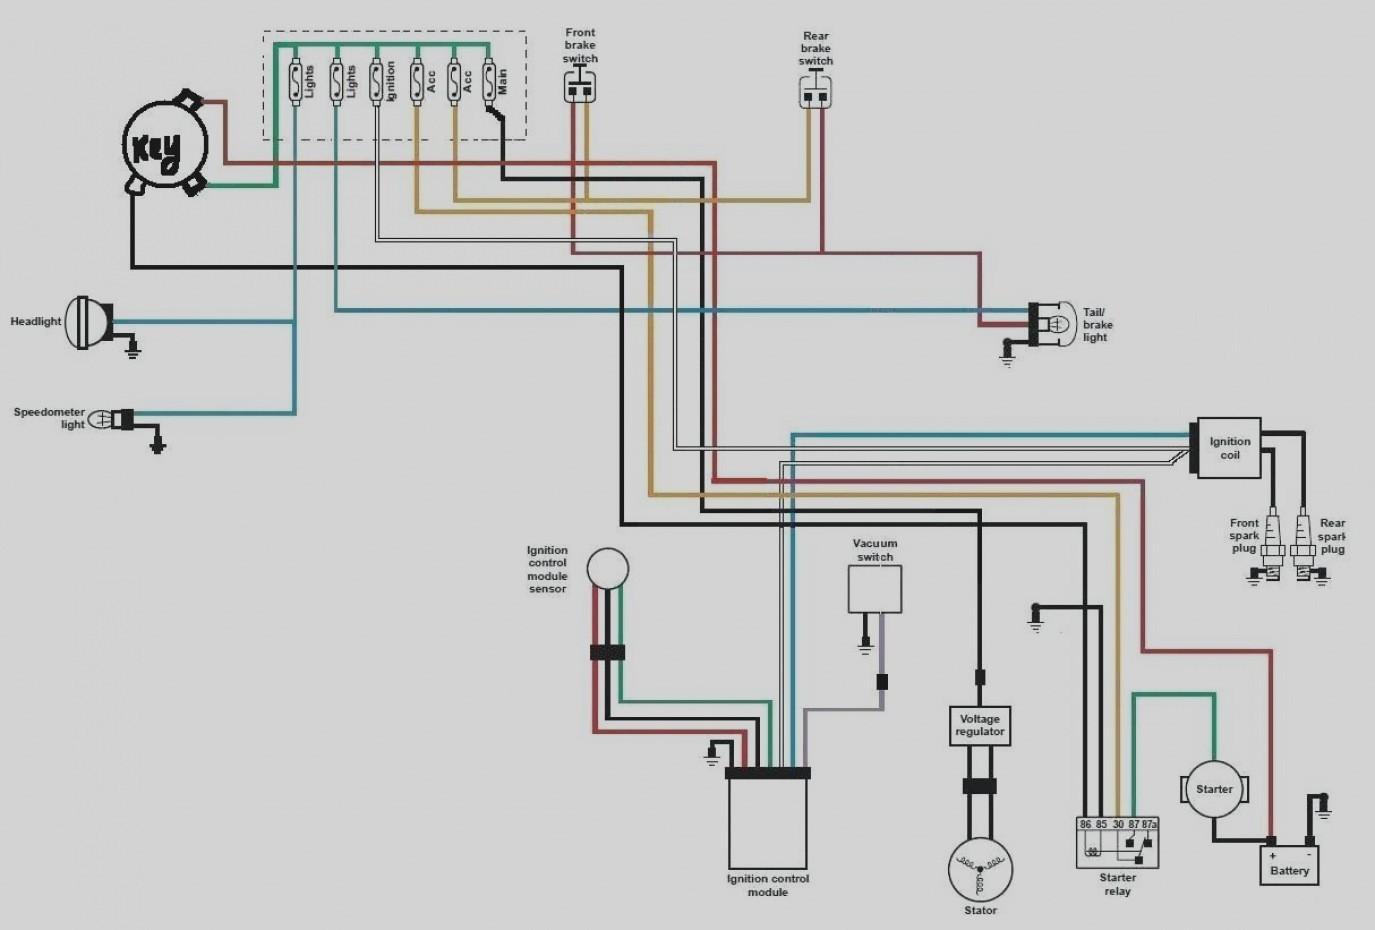 2014 sportster wiring diagram wx 3264  diagram likewise harley davidson wiring diagram as well  likewise harley davidson wiring diagram